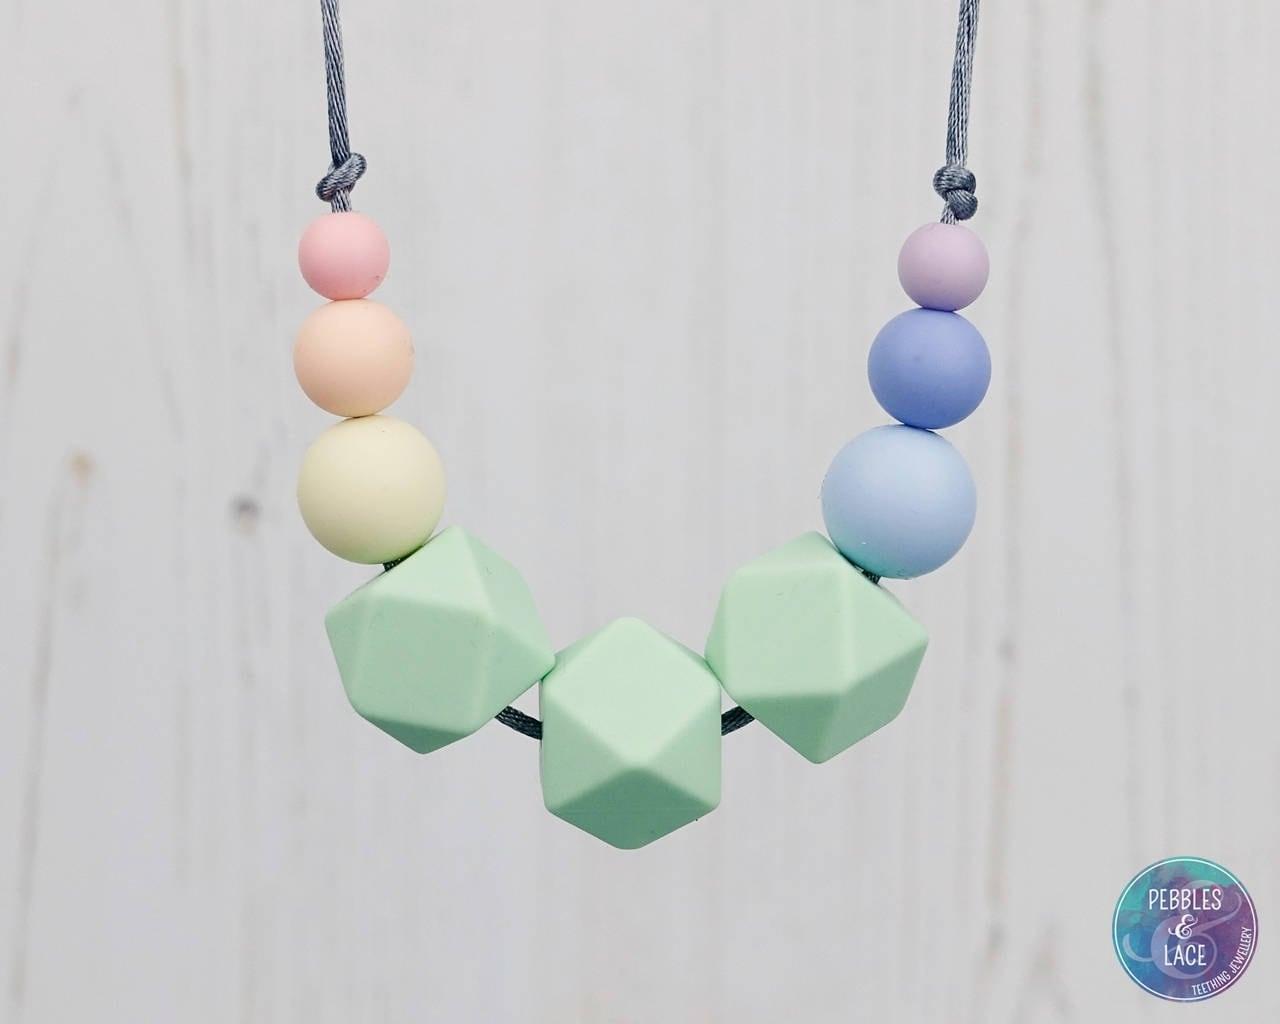 Sensory Silicone Necklace Teething Necklace Mum Jewellery Nursing Necklace Teething Jewellery Geometric Jewellery Pastel Rainbow